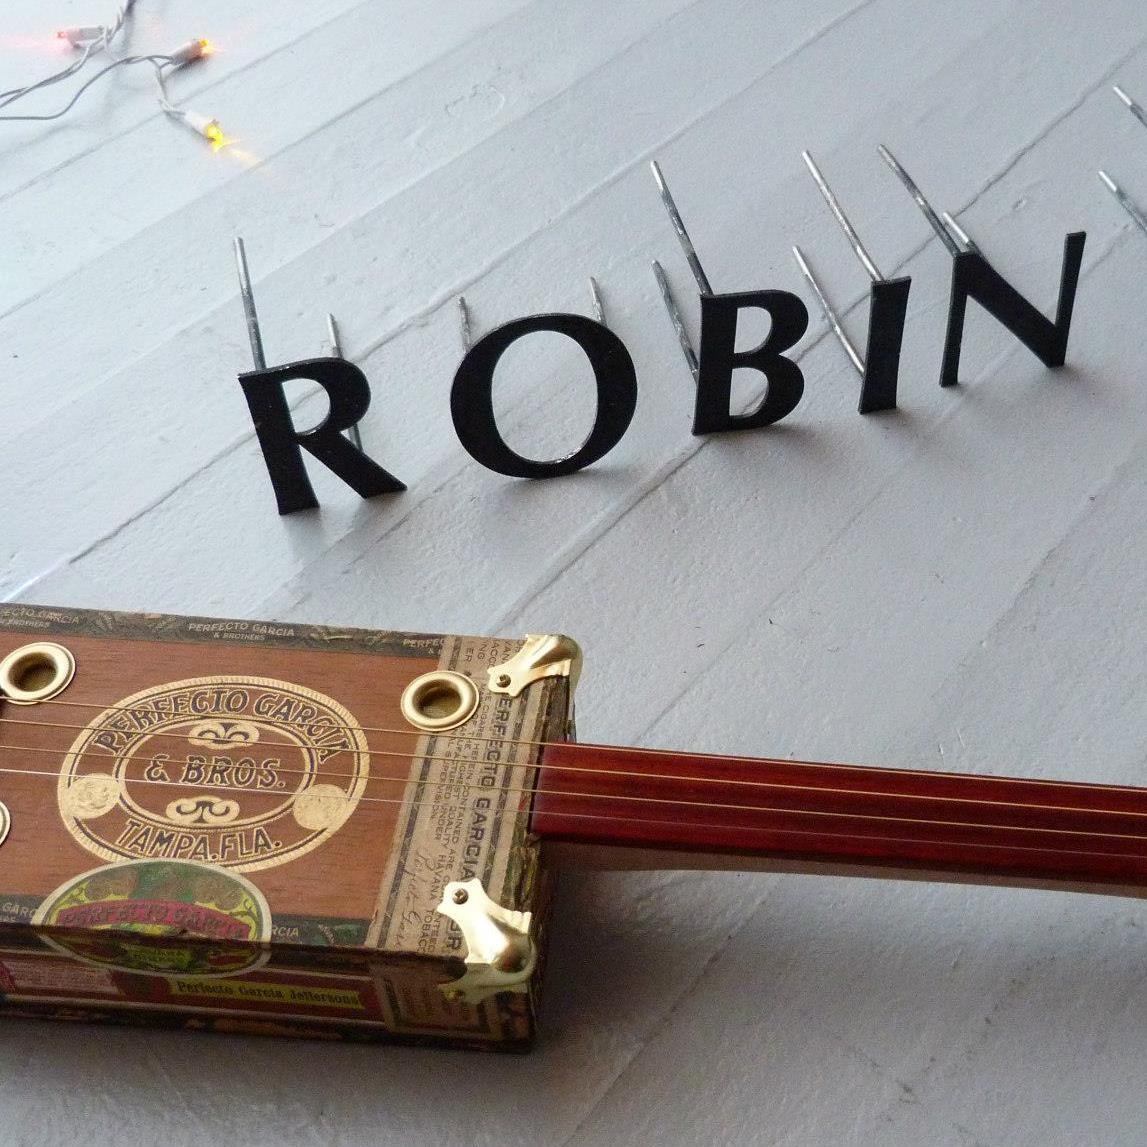 Robin Bott